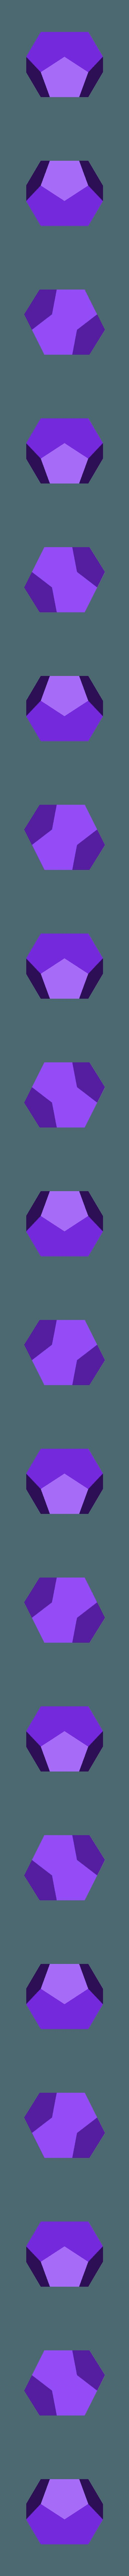 Planter.stl Download free STL file Levitating Planter • 3D print design, Ananords